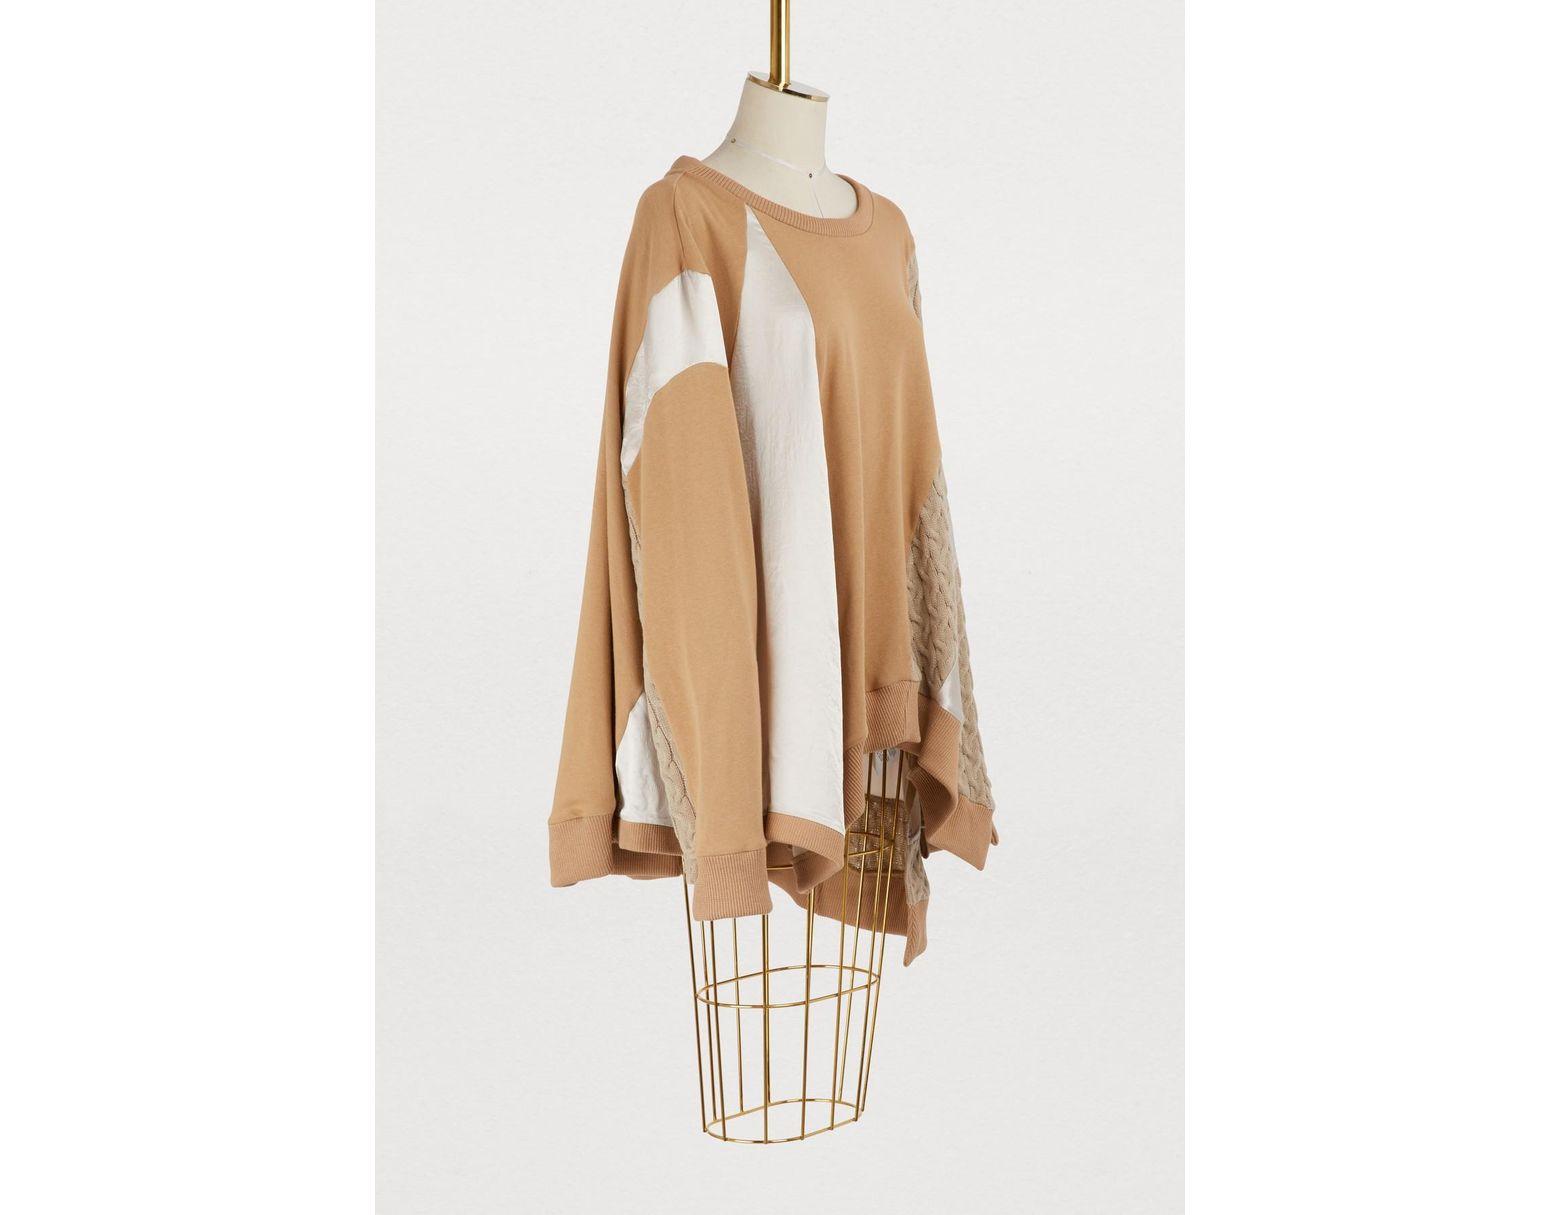 5e696a2313 Lyst - Koche Cutout Sweater in Natural - Save 25%